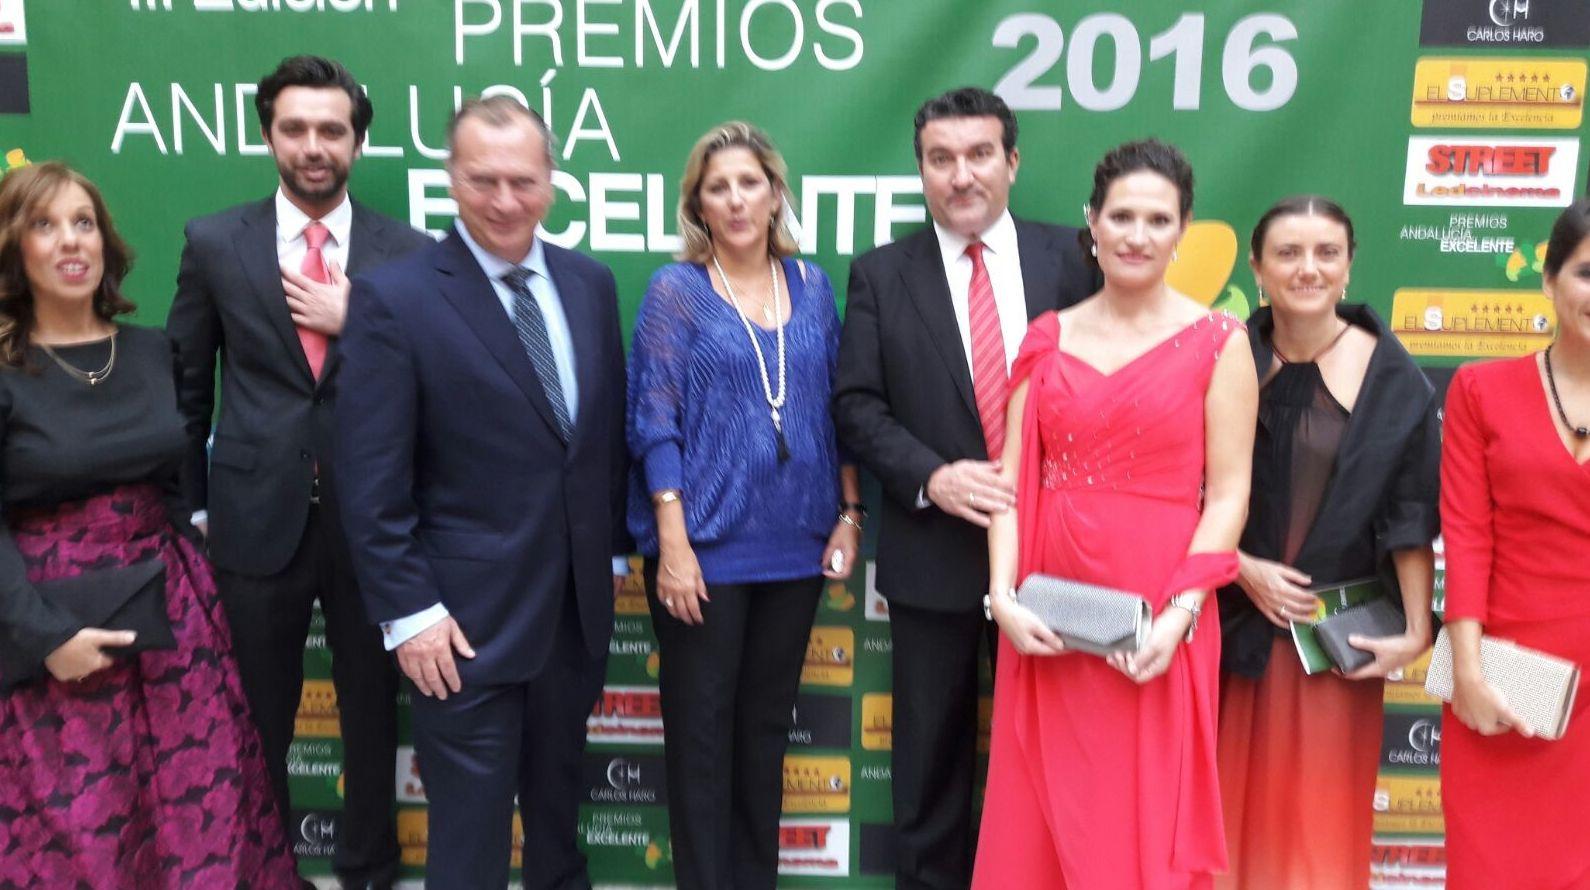 Andalucía Excelente: Premio de derecho al Bufete Monzón Martos Abogados (LEGALSEGUR S.L.P.U)